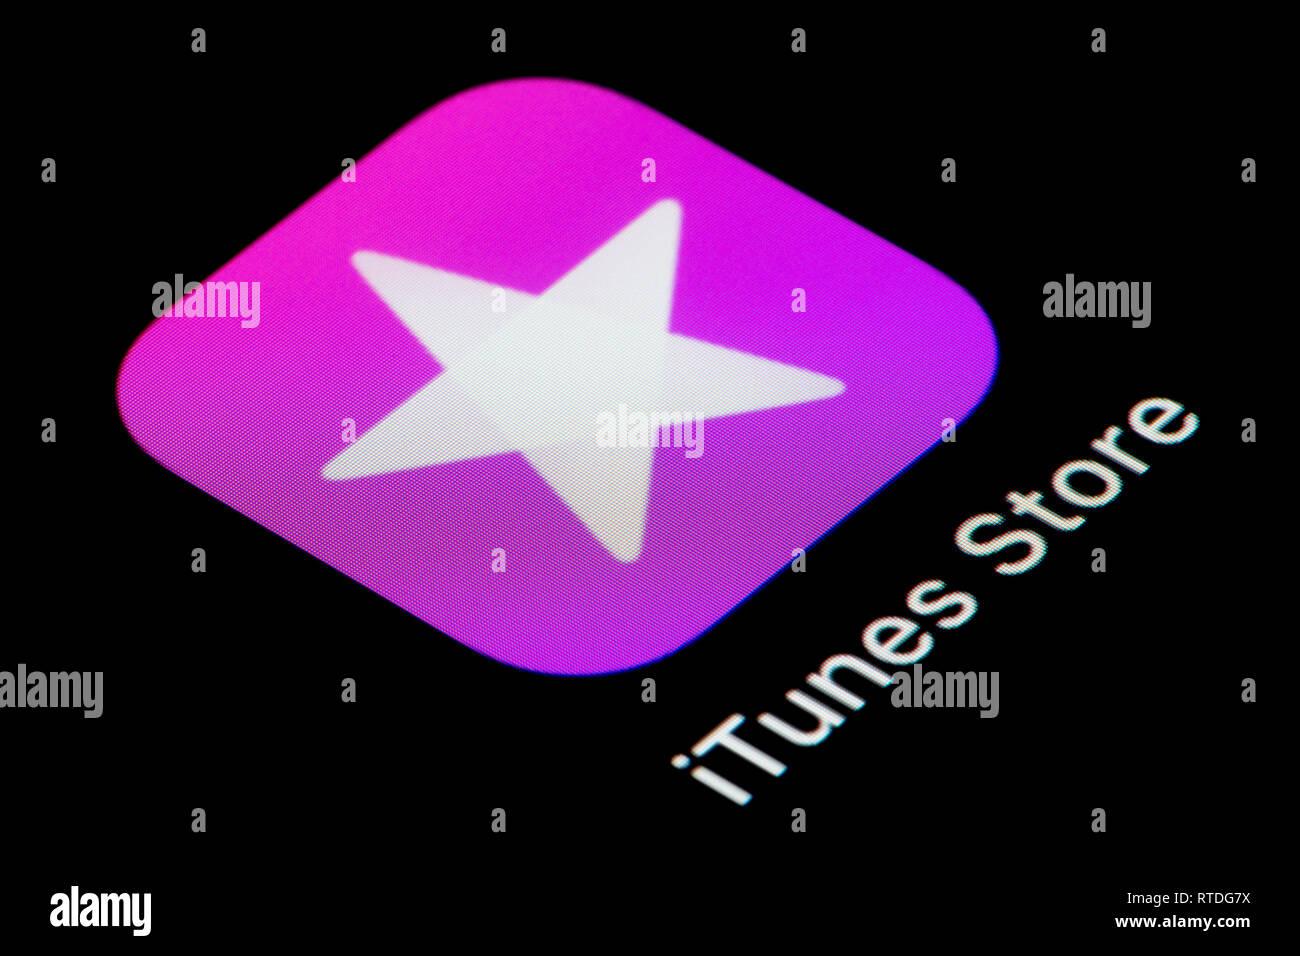 Itunes Stock Photos & Itunes Stock Images - Alamy